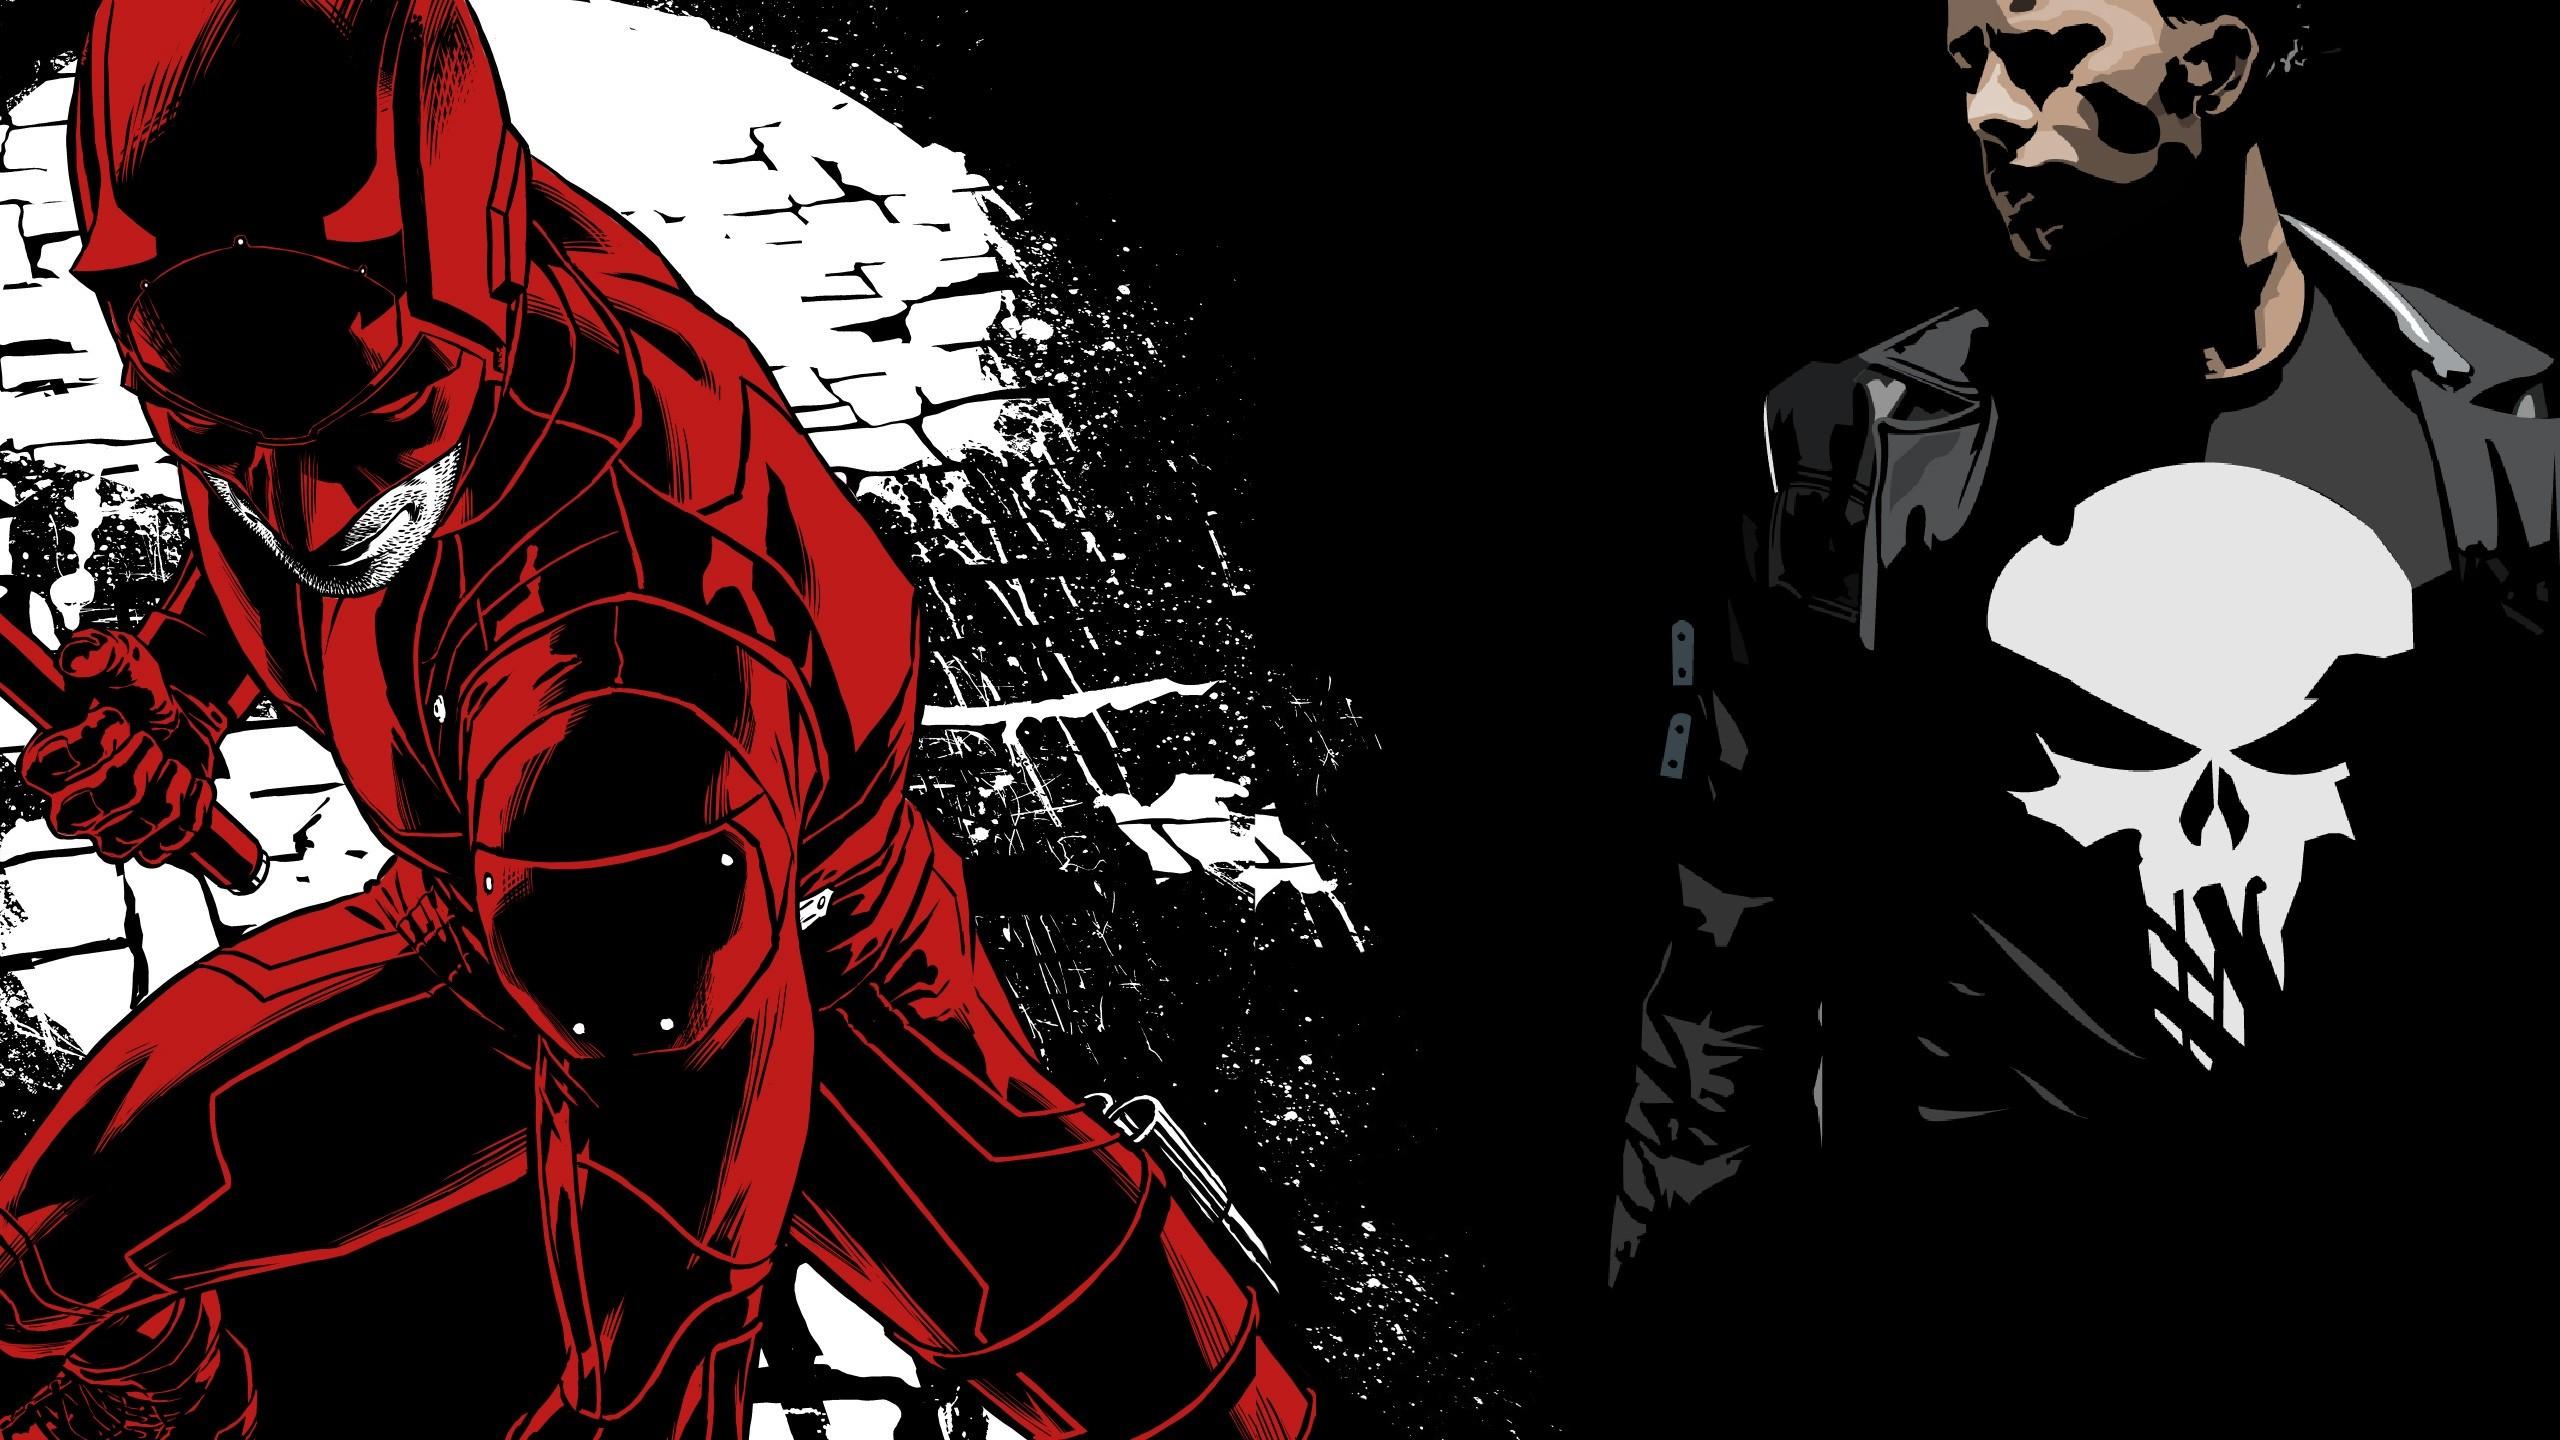 Daredevil & Punisher Wallpapers